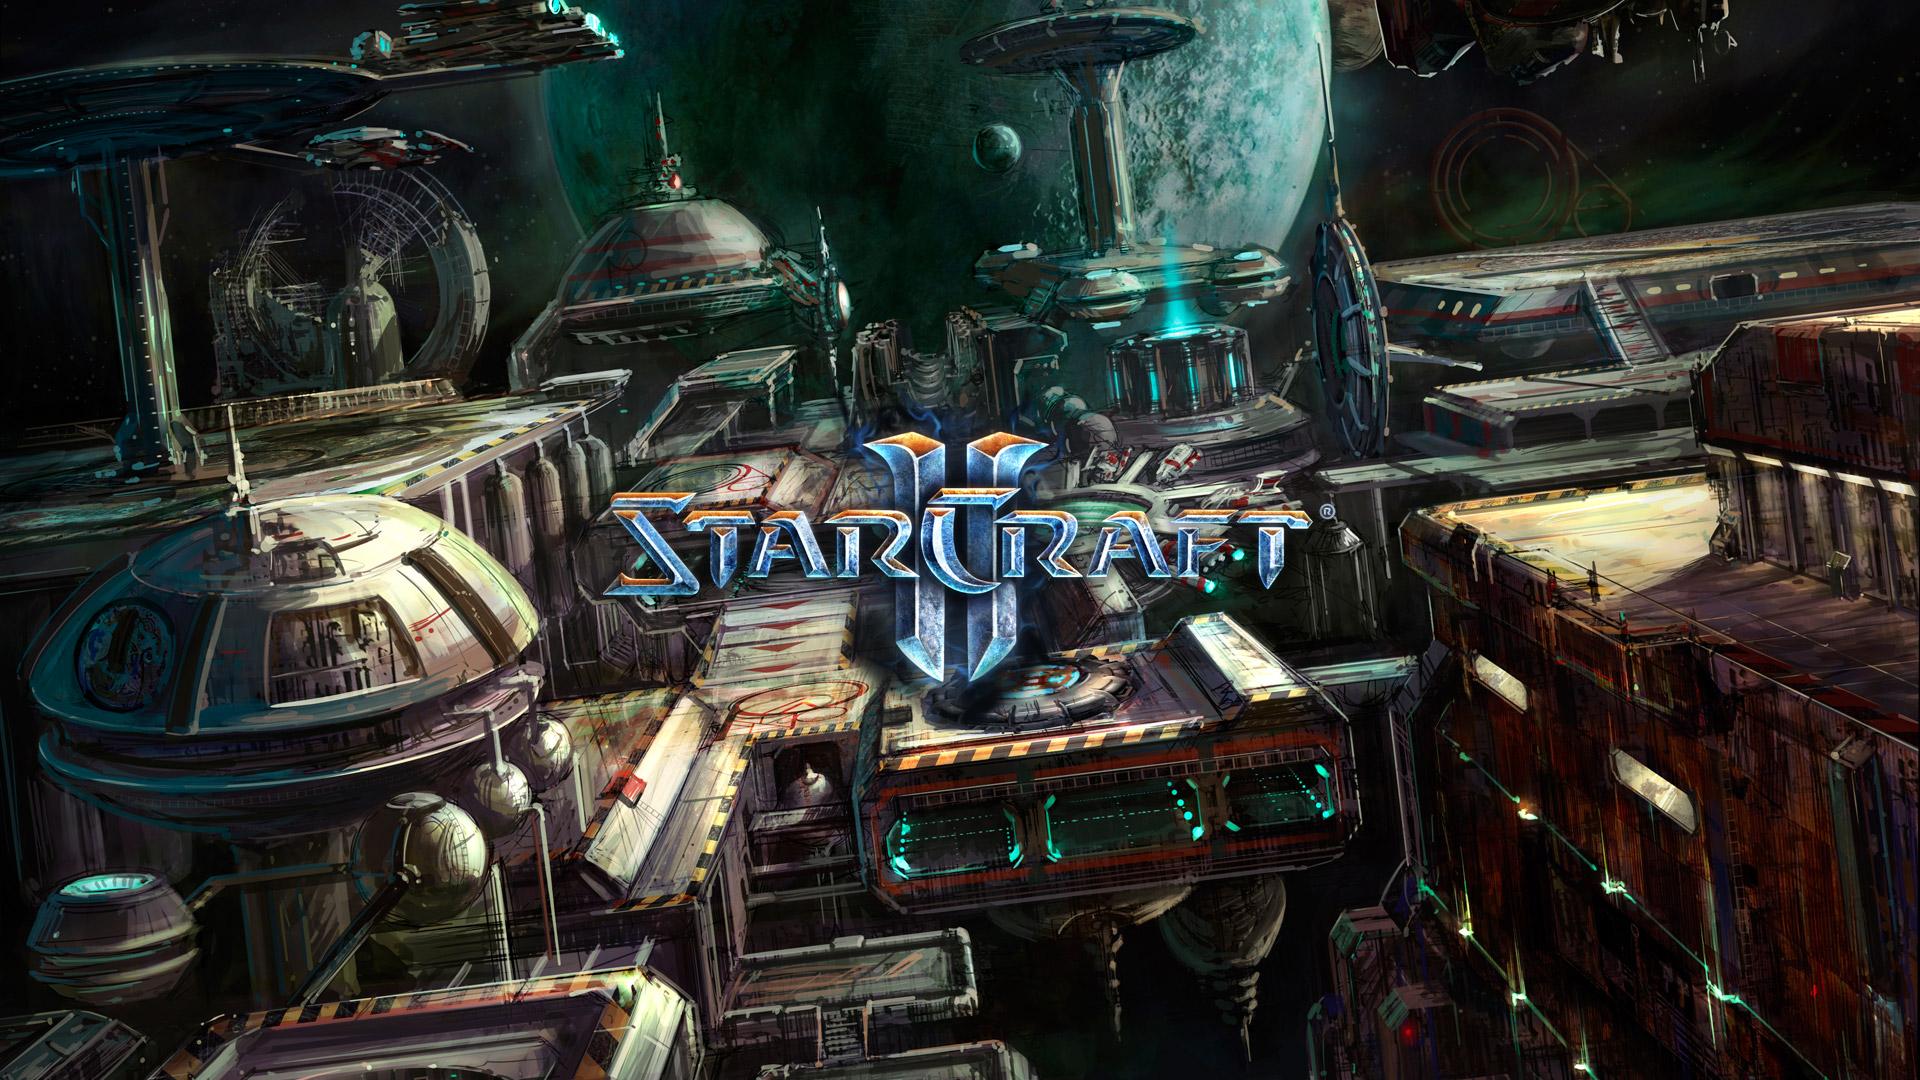 Free Starcraft 2 Wallpaper in 1920x1080